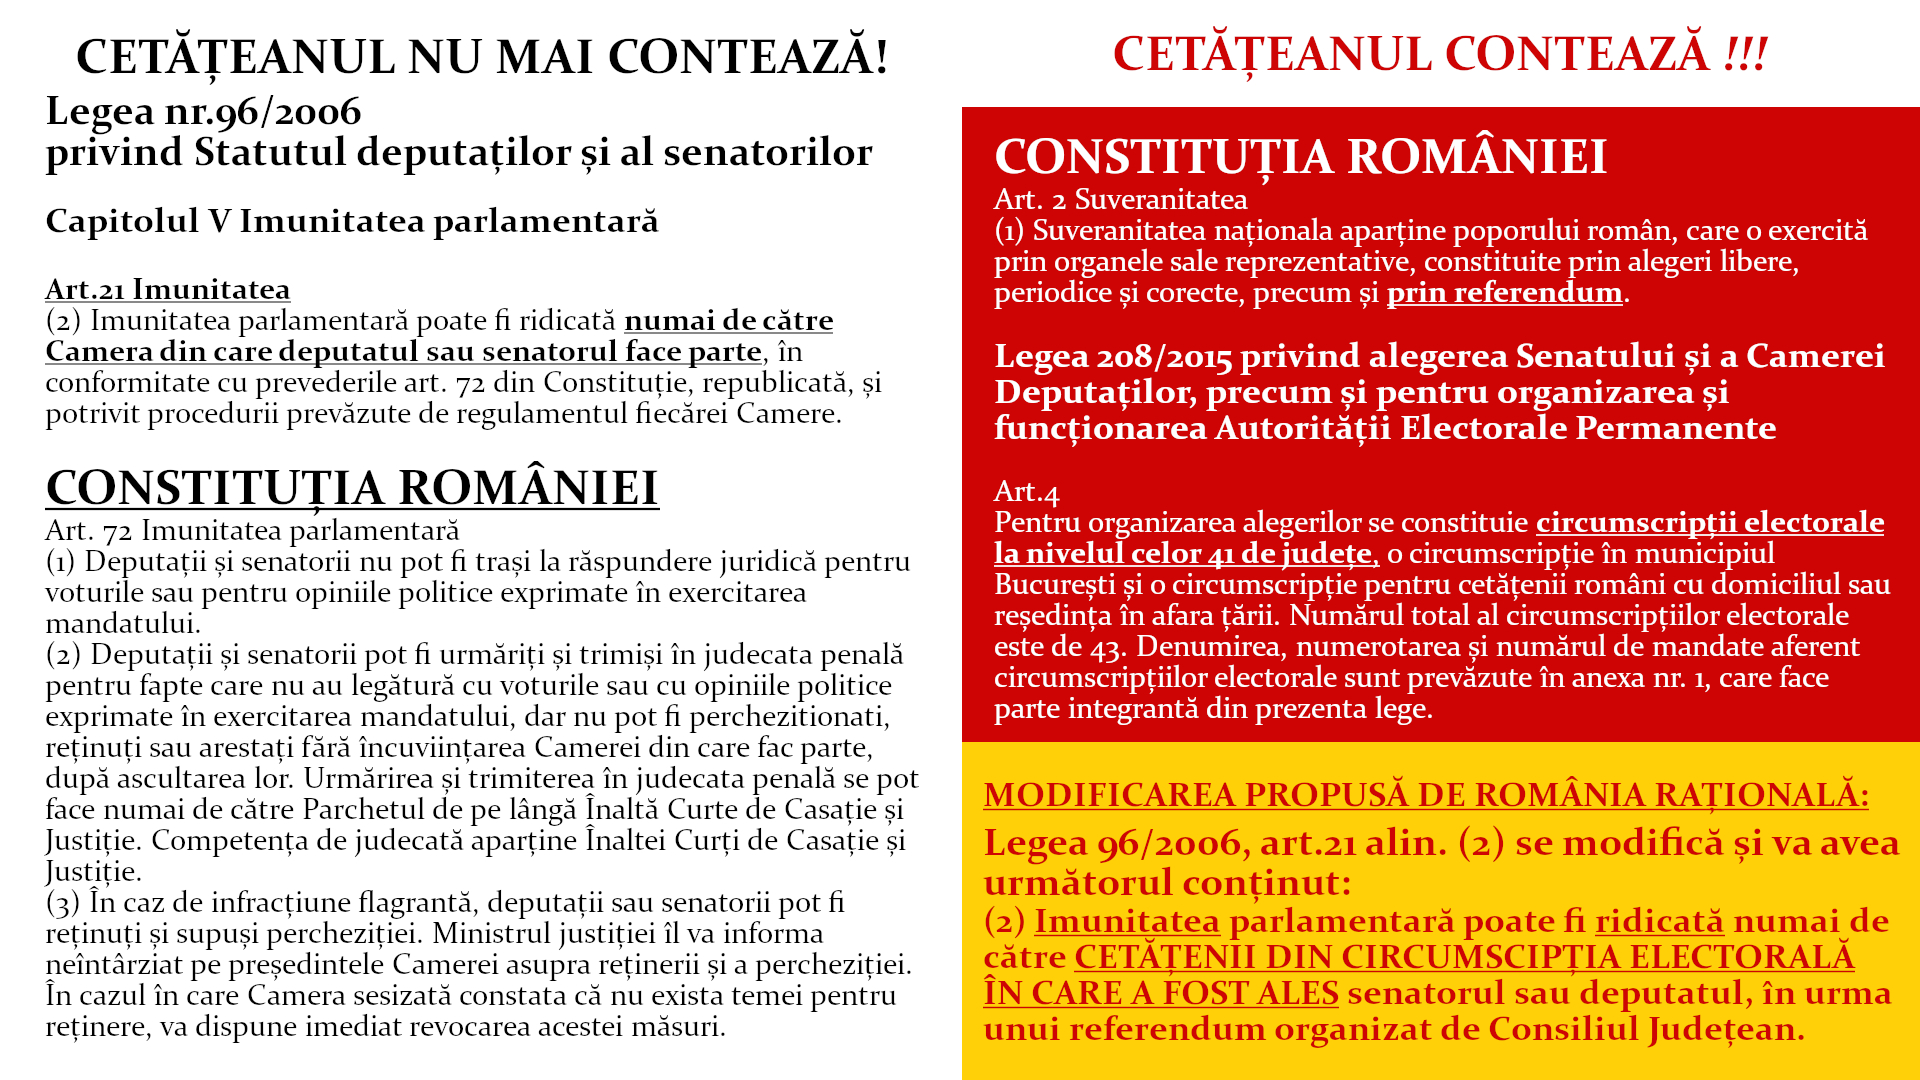 https://ziarul.romania-rationala.ro/control/articole/articole/imunitatea-prin-referendum.jpg